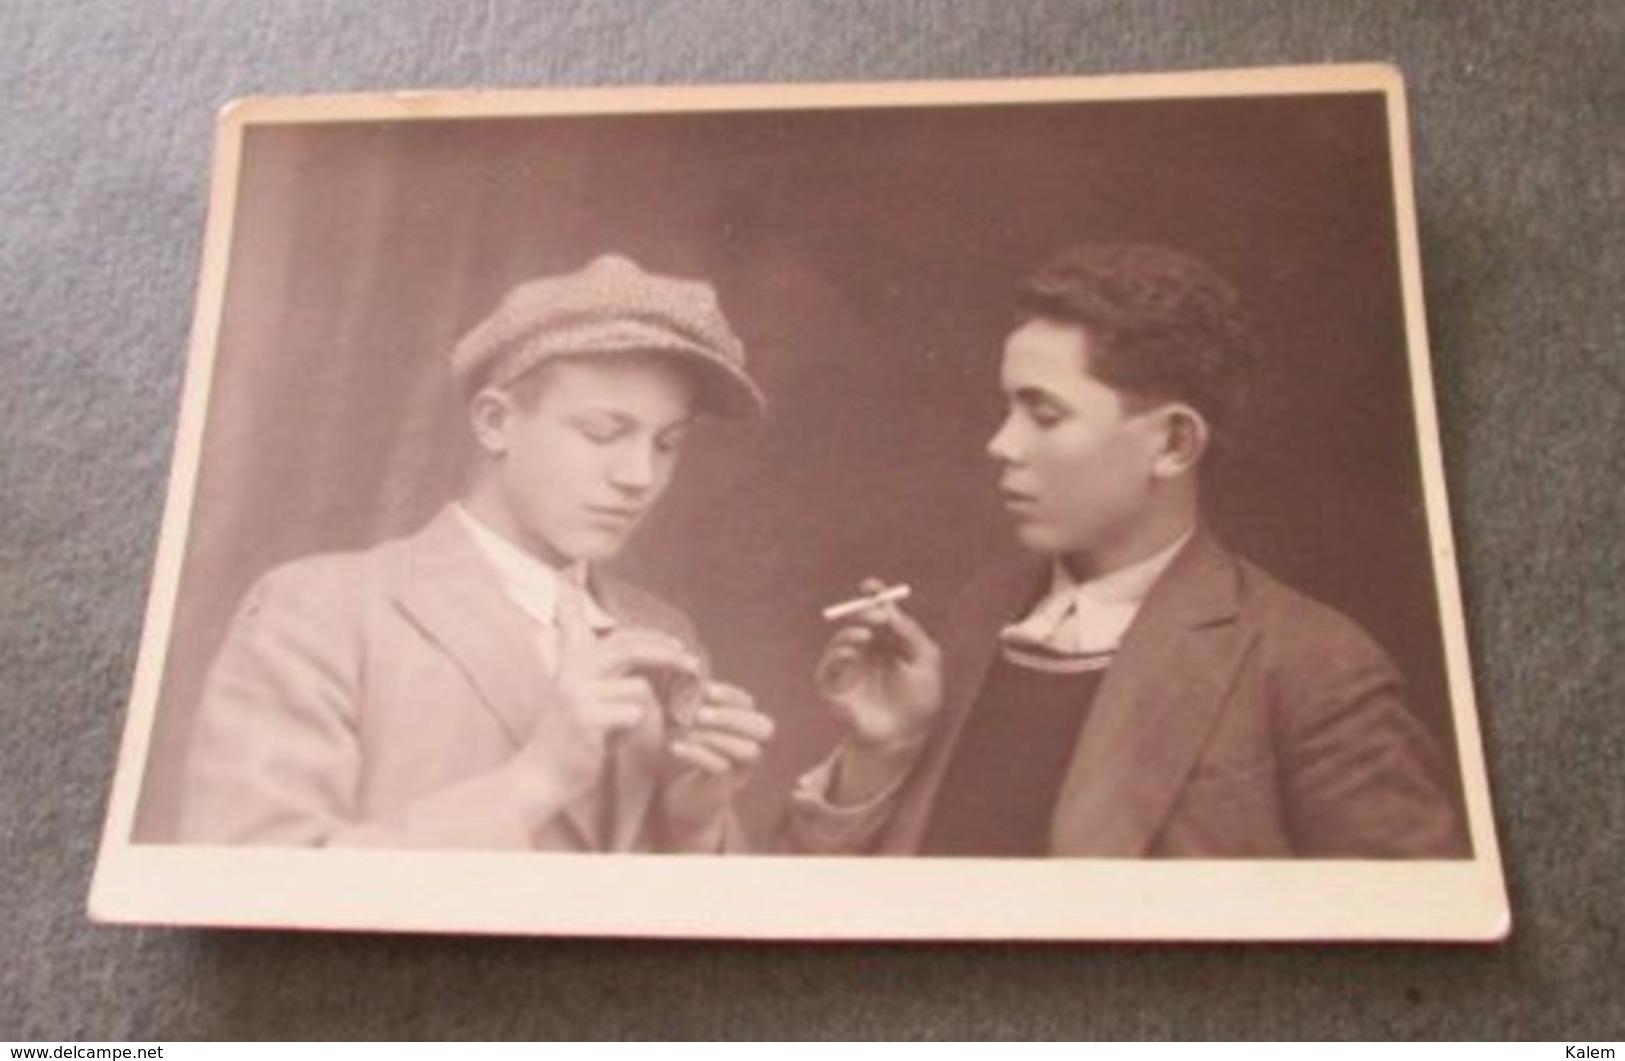 2 YOUNG BOYS SMOKING  , 2 JEUNES GARÇONS FUMANT, PHOTO FROM 1932  ORIGINAL PHOTO - Personnes Anonymes